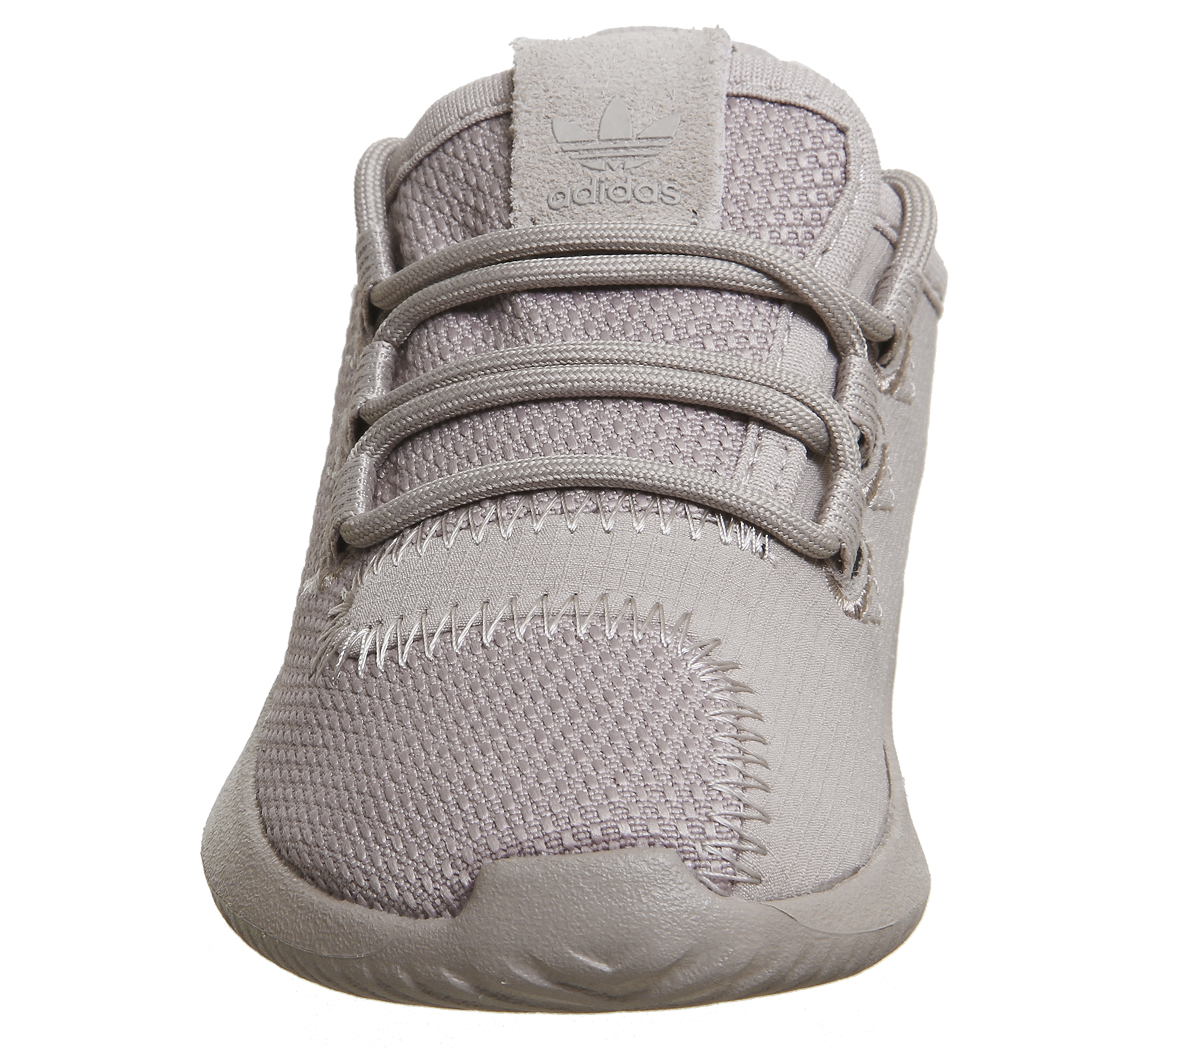 e98ae31a Sentinel Kids Adidas Tubular Shadow Infant Trainers Vapour Grey Kids